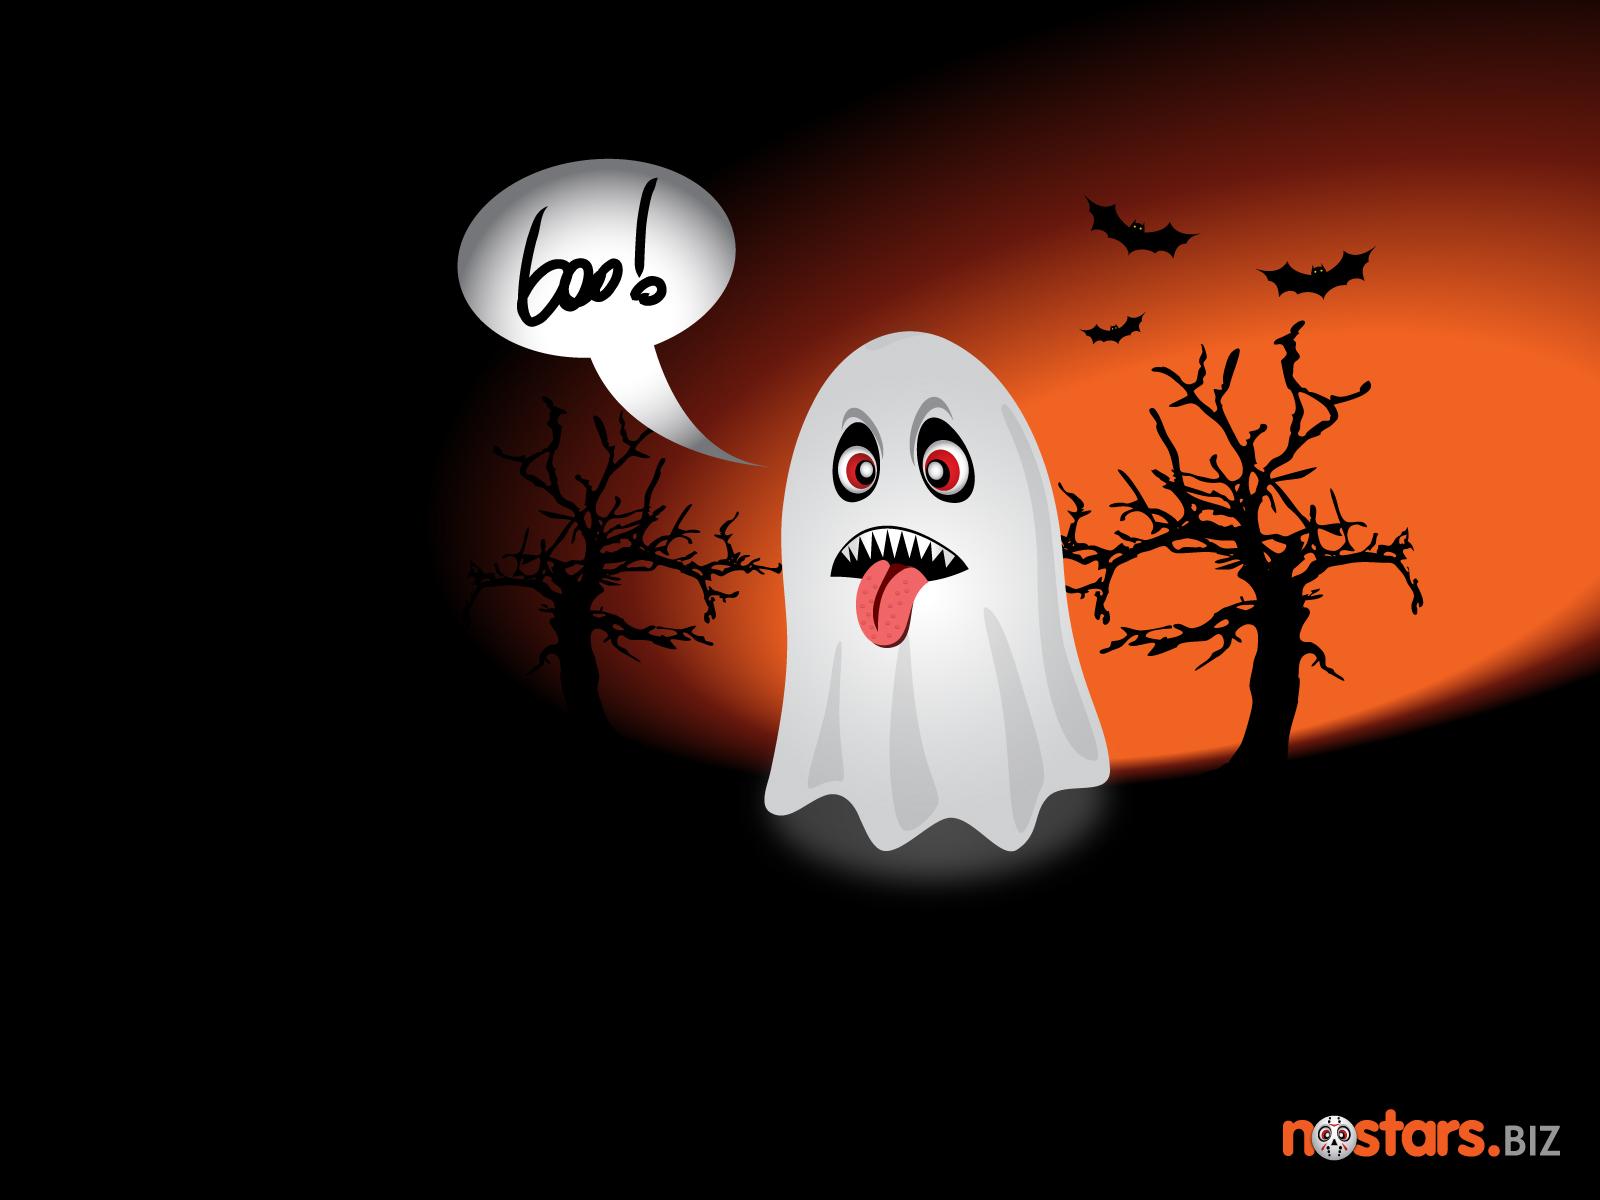 Хелоуин/Самхейн/Сауин - възникване, обичаи. Halloween_Ghost_Wallpaper_2_by_redmorph